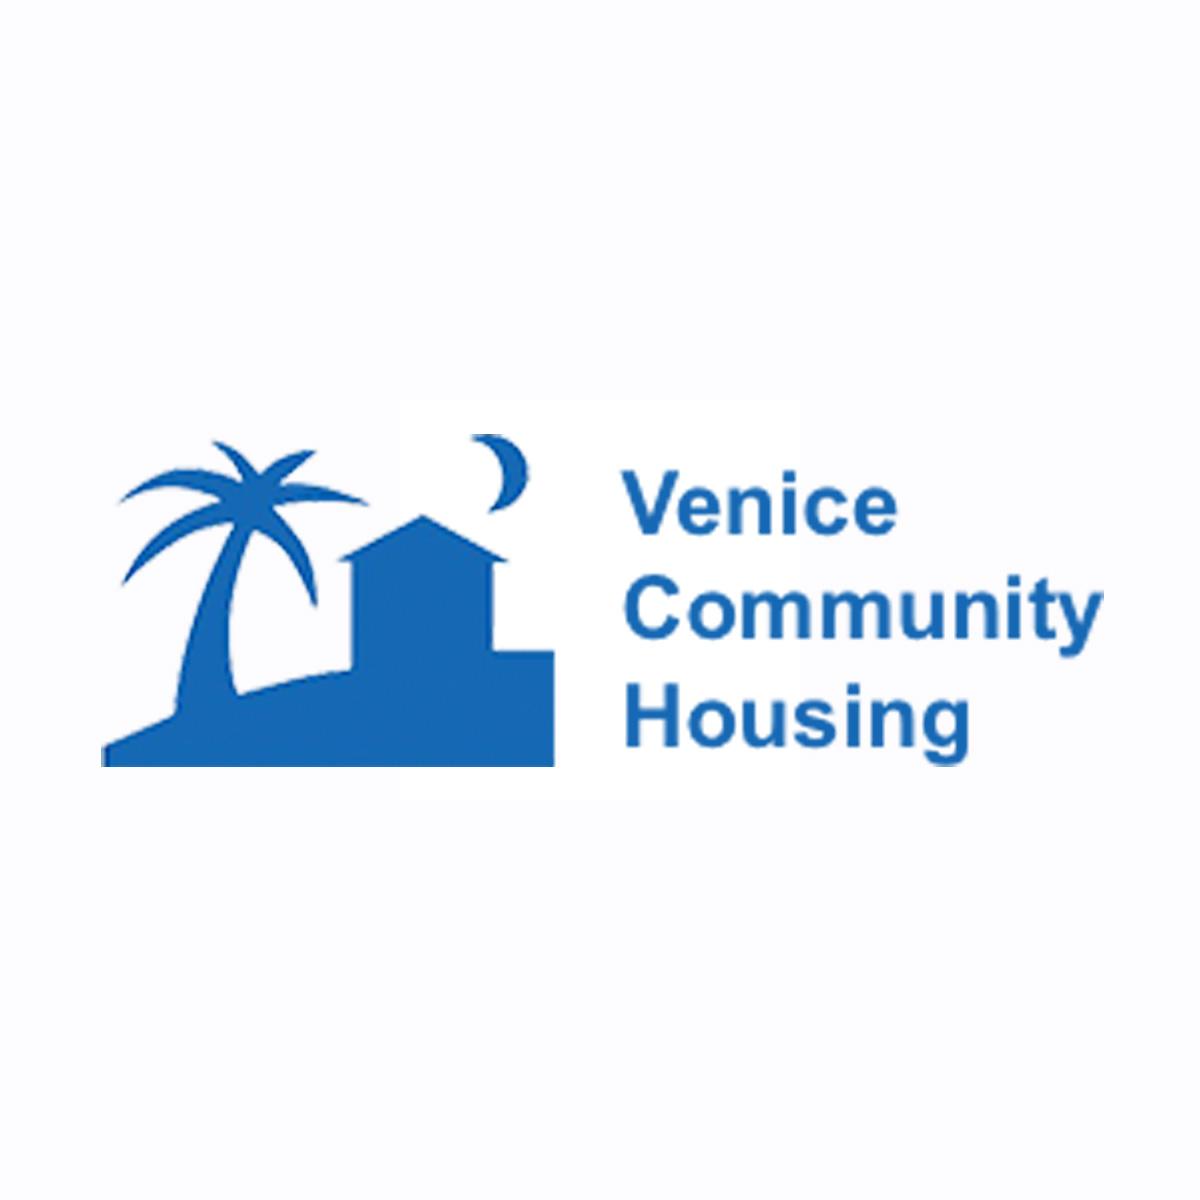 Venice 400x400.jpg